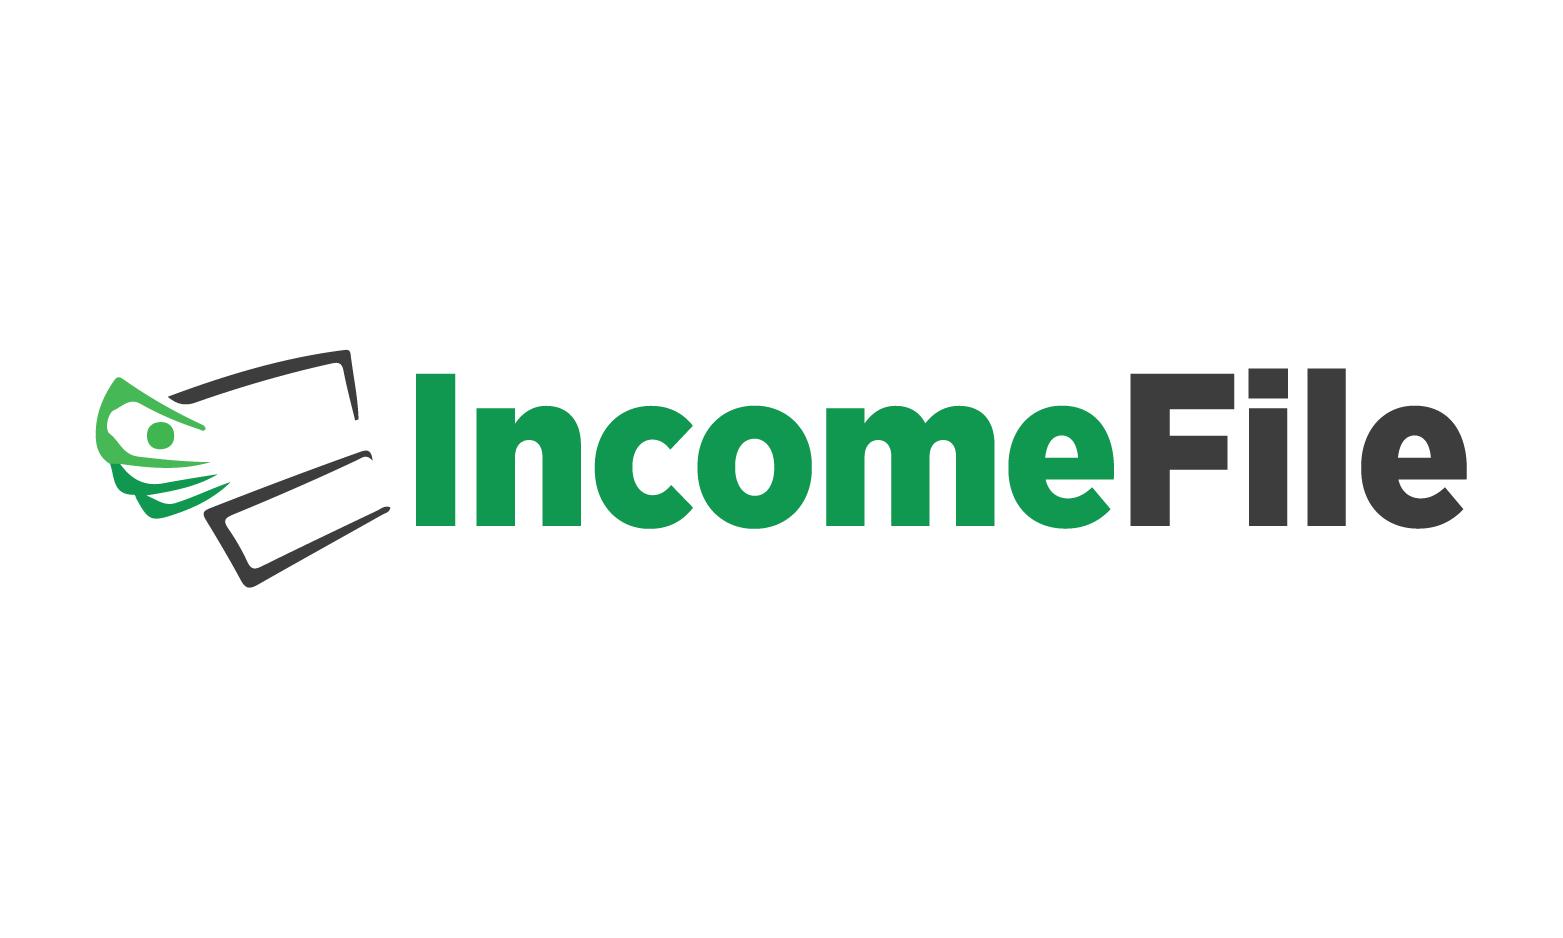 IncomeFile.com